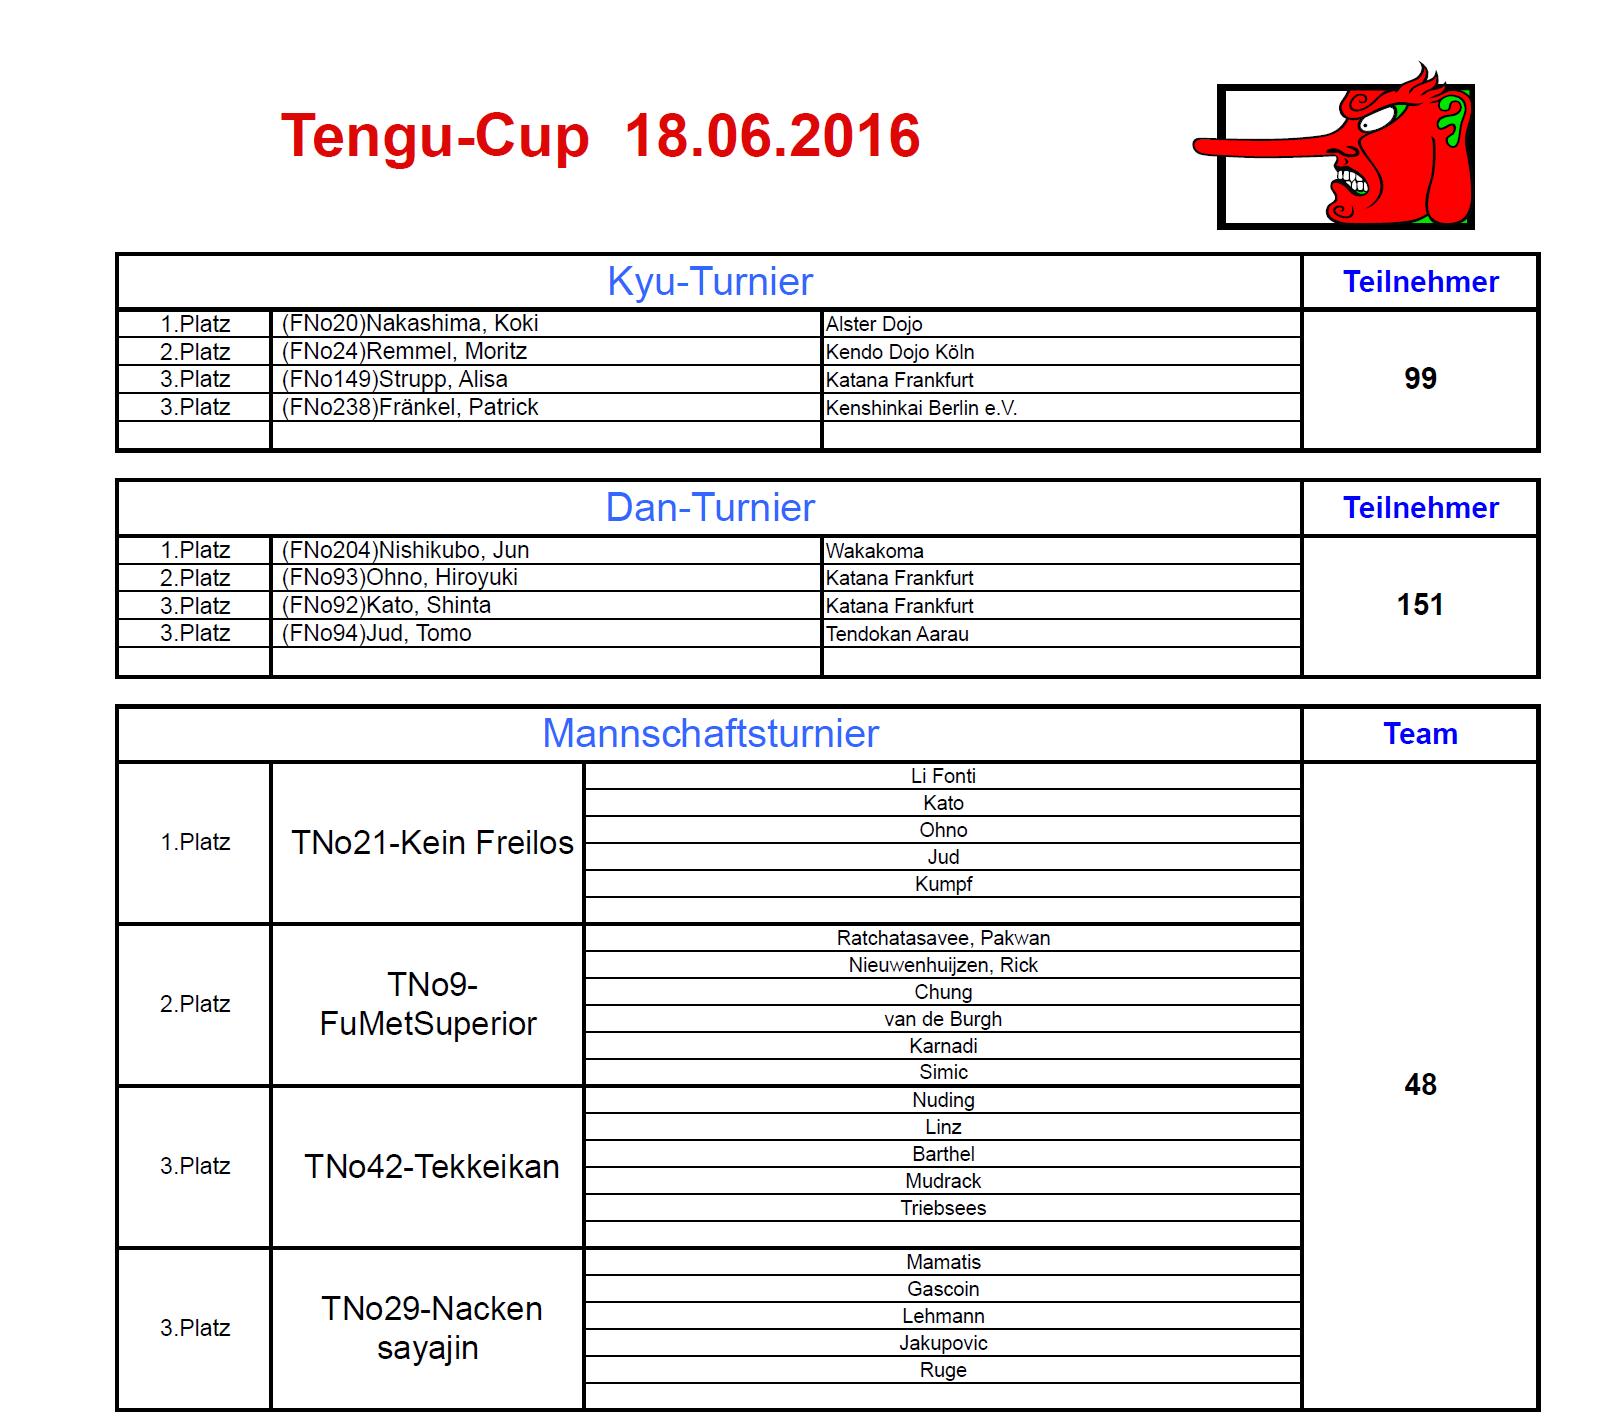 tengu cup 2016 result